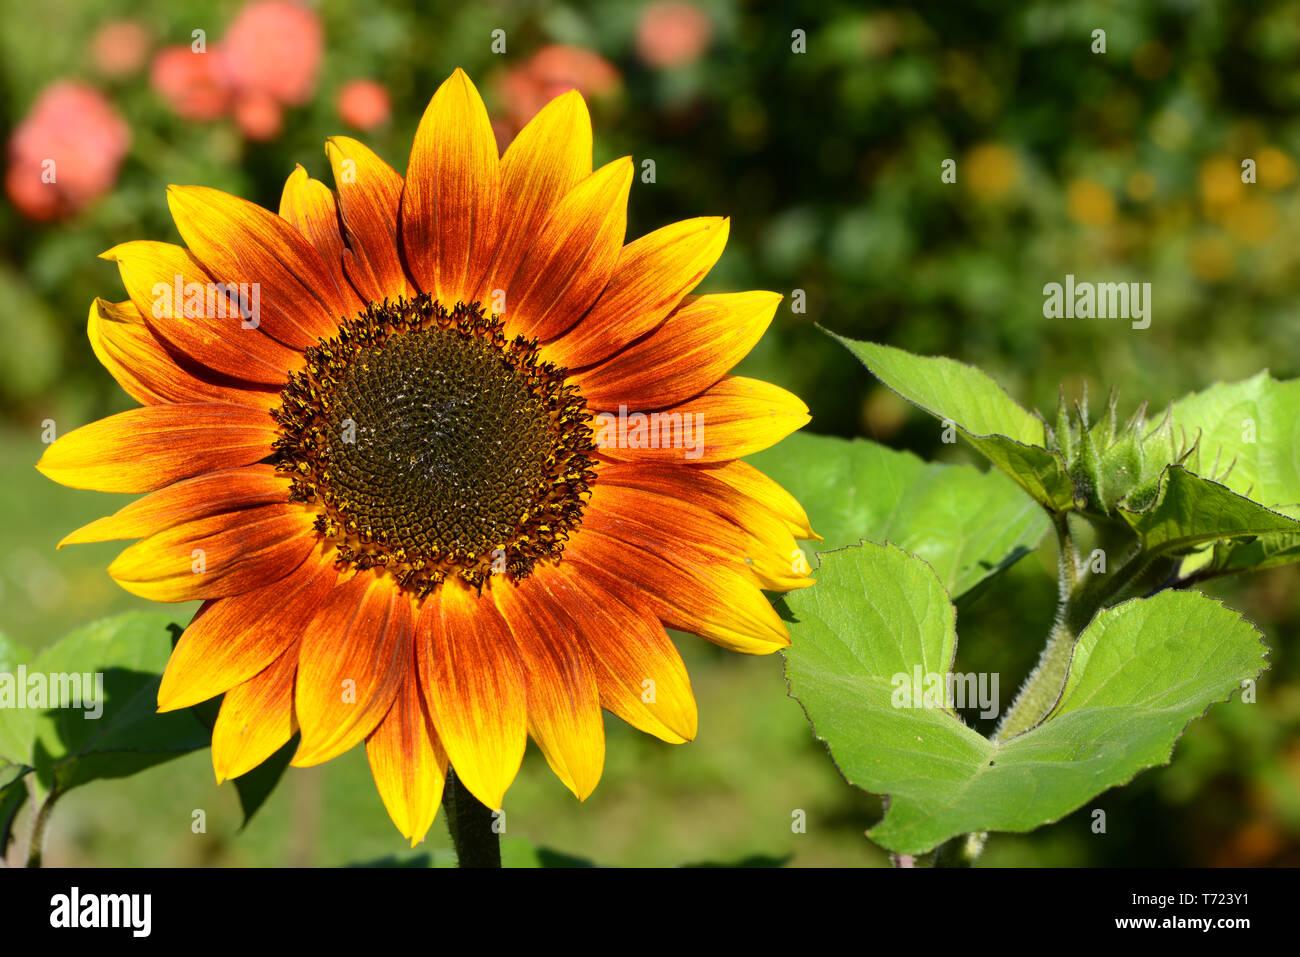 Flowers 848 - Stock Image